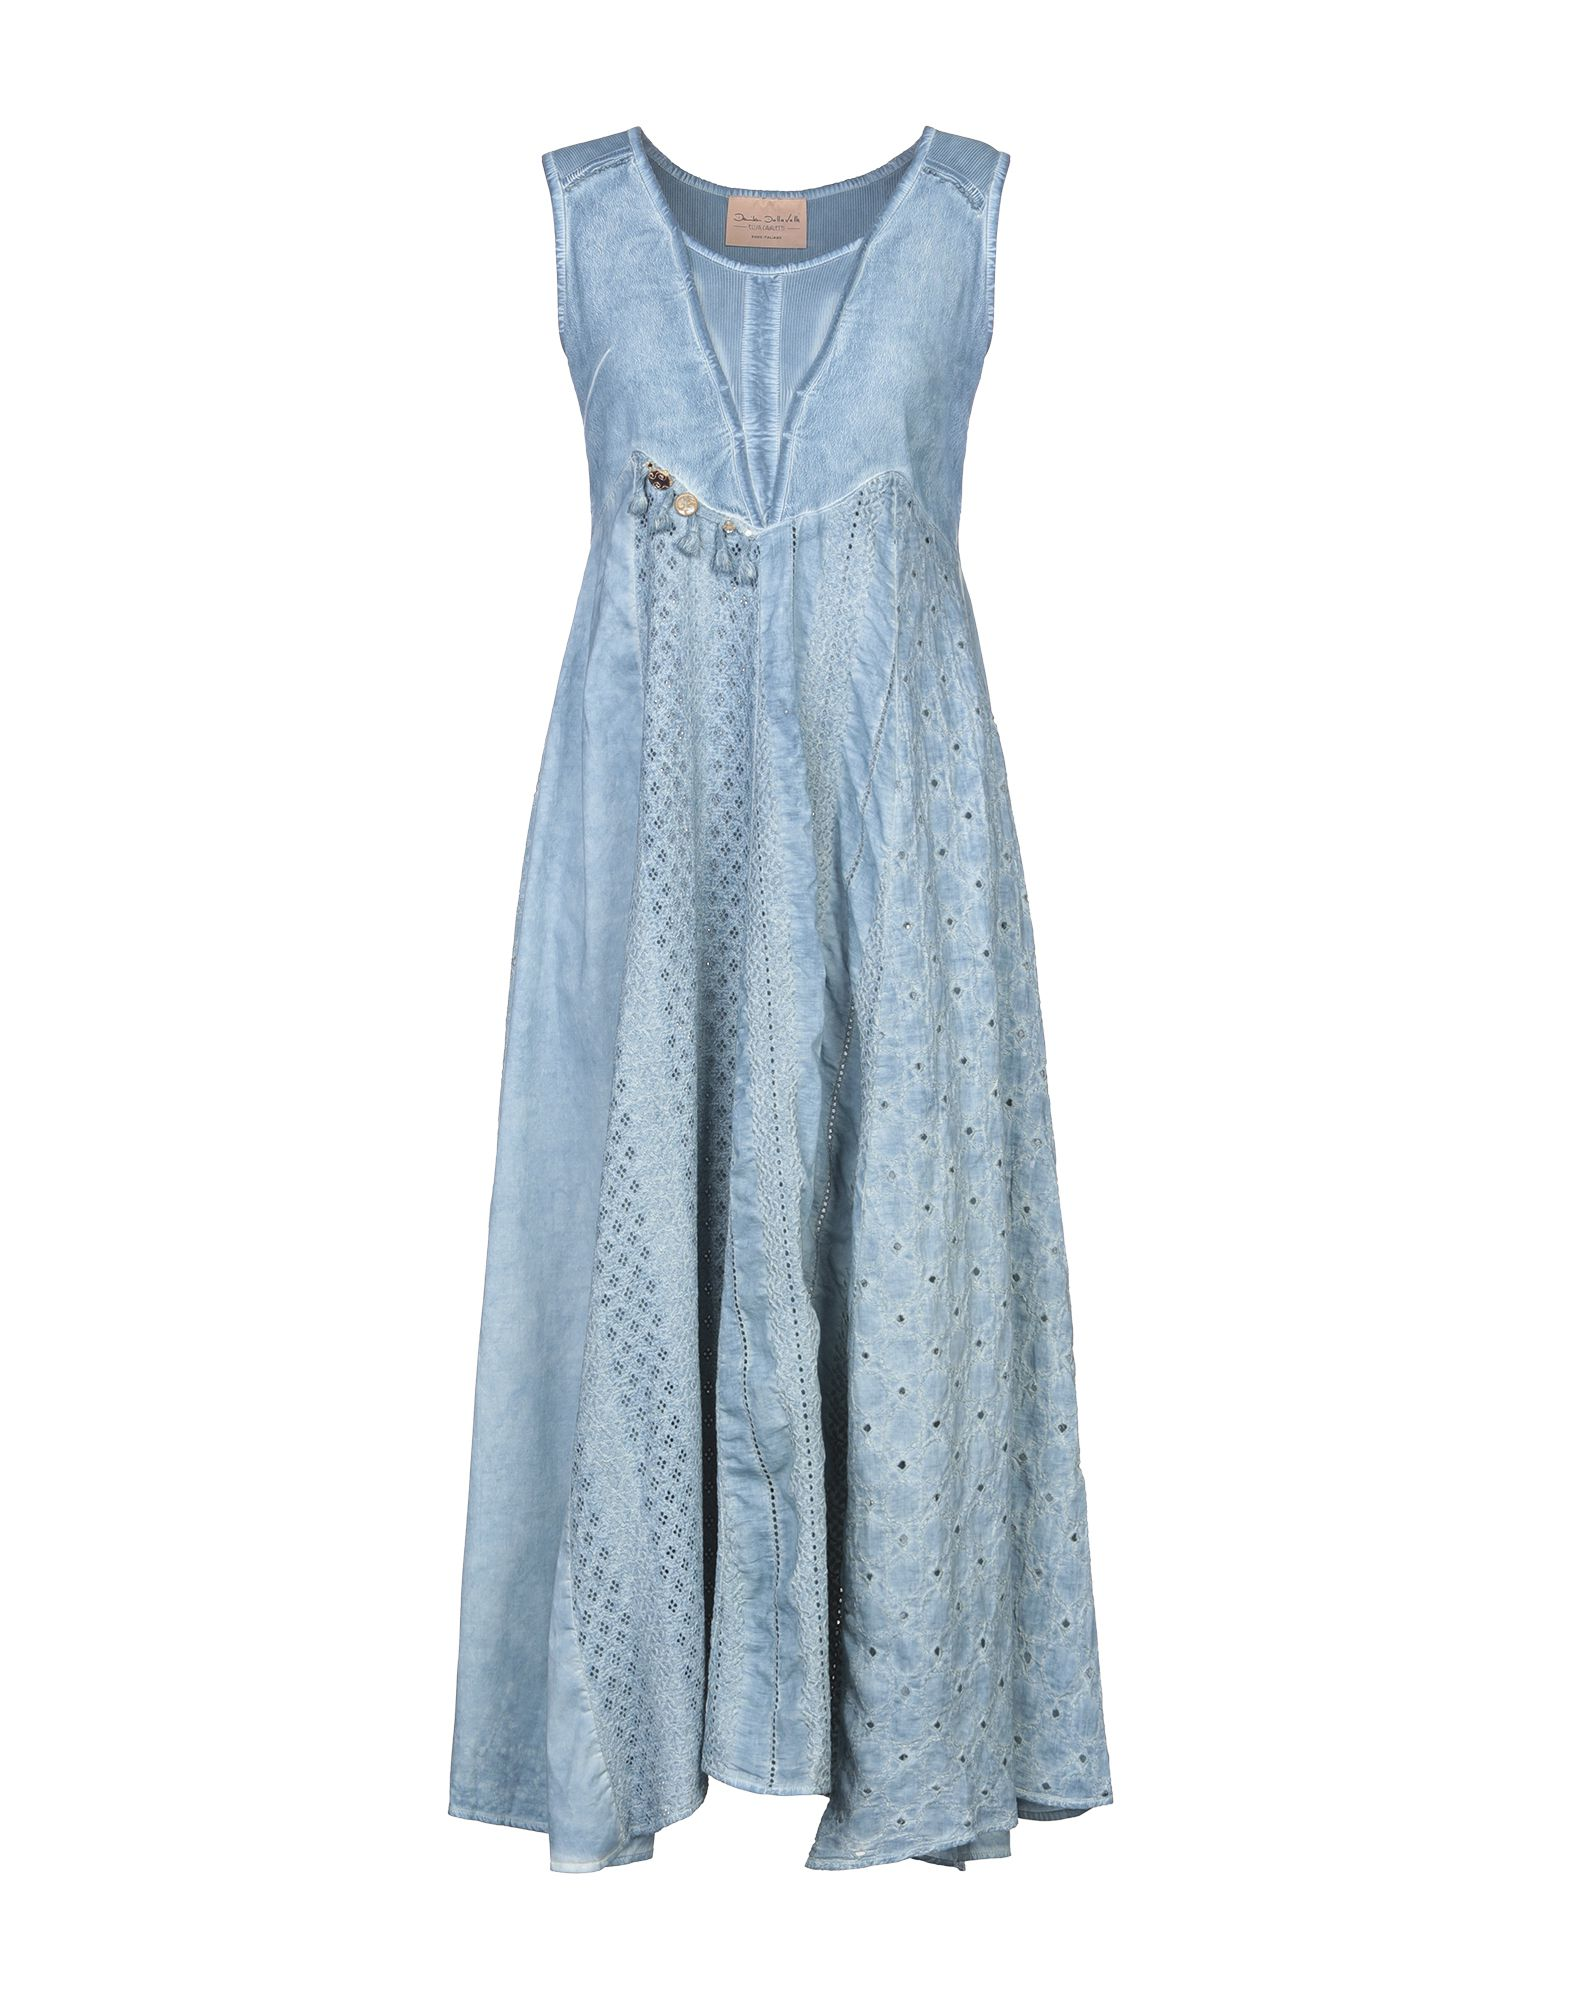 ELISA CAVALETTI by DANIELA DALLAVALLE Платье длиной 3/4